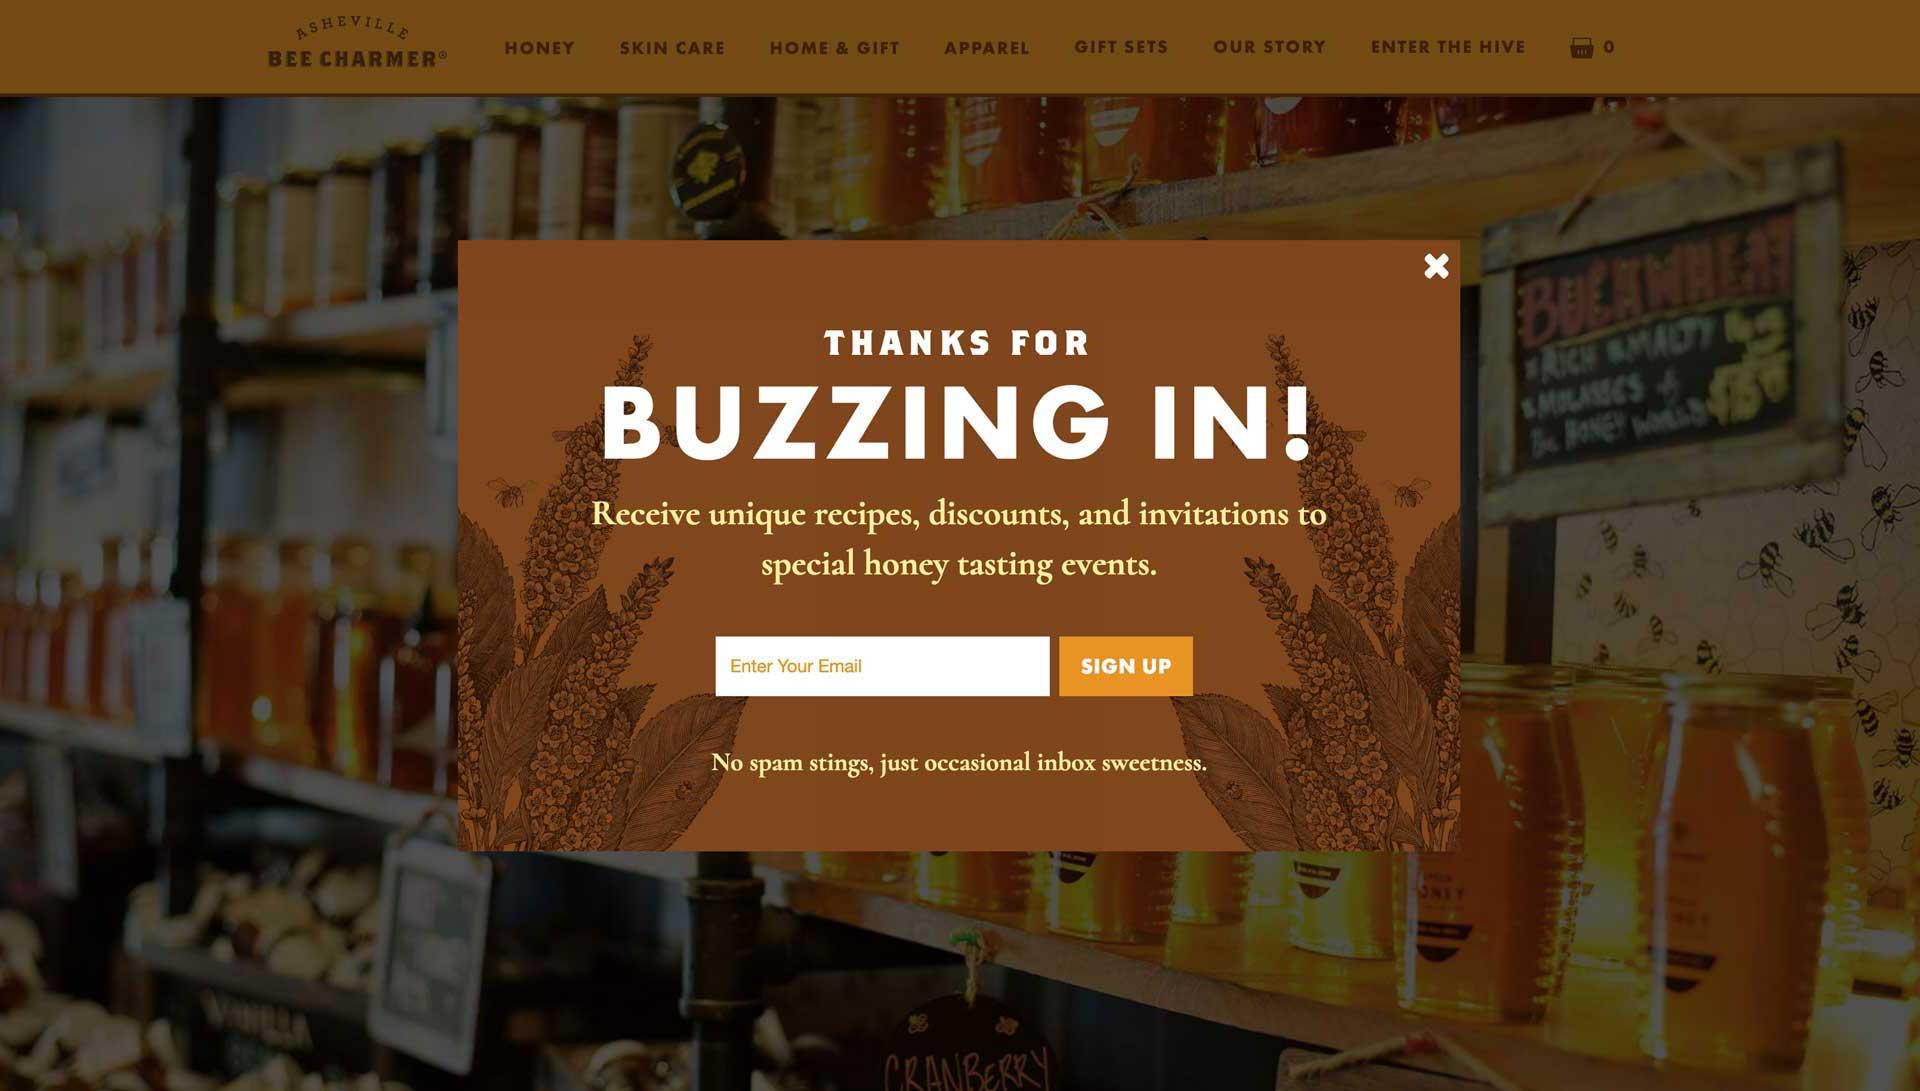 Asheville Bee Charmer popup design